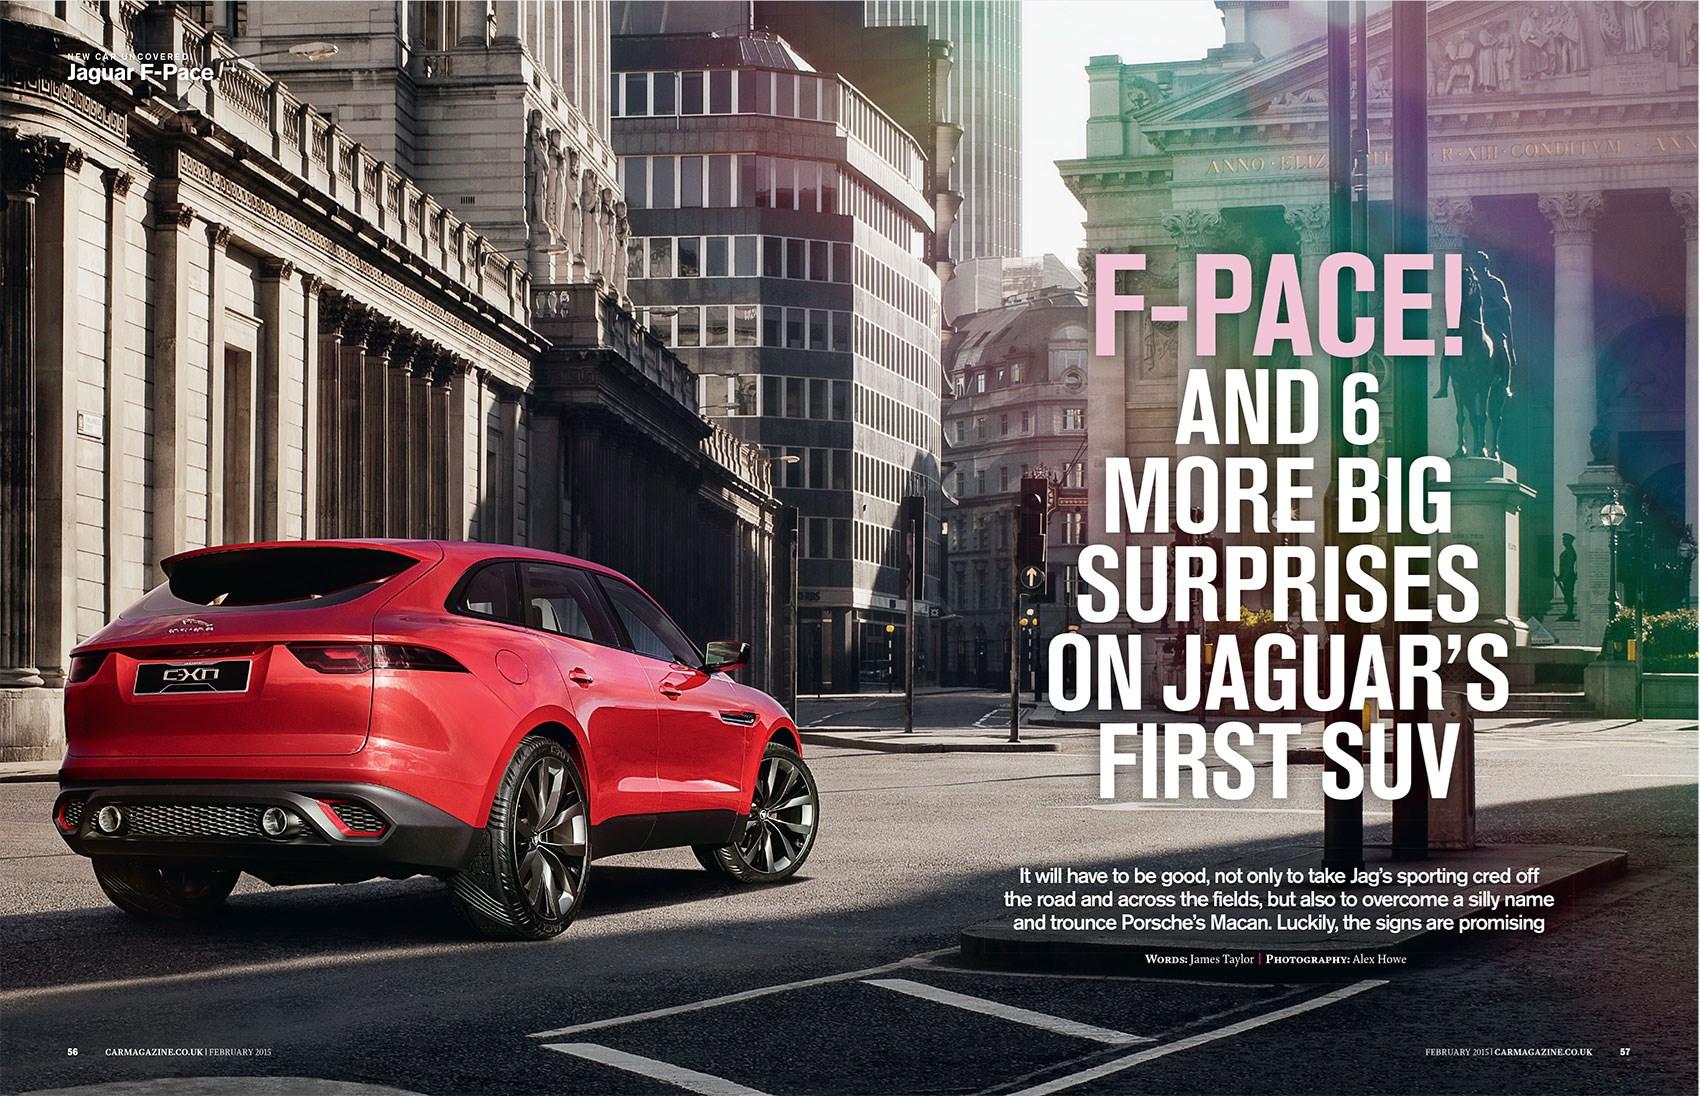 Jaguar F-Pace: CAR magazine, February 2015